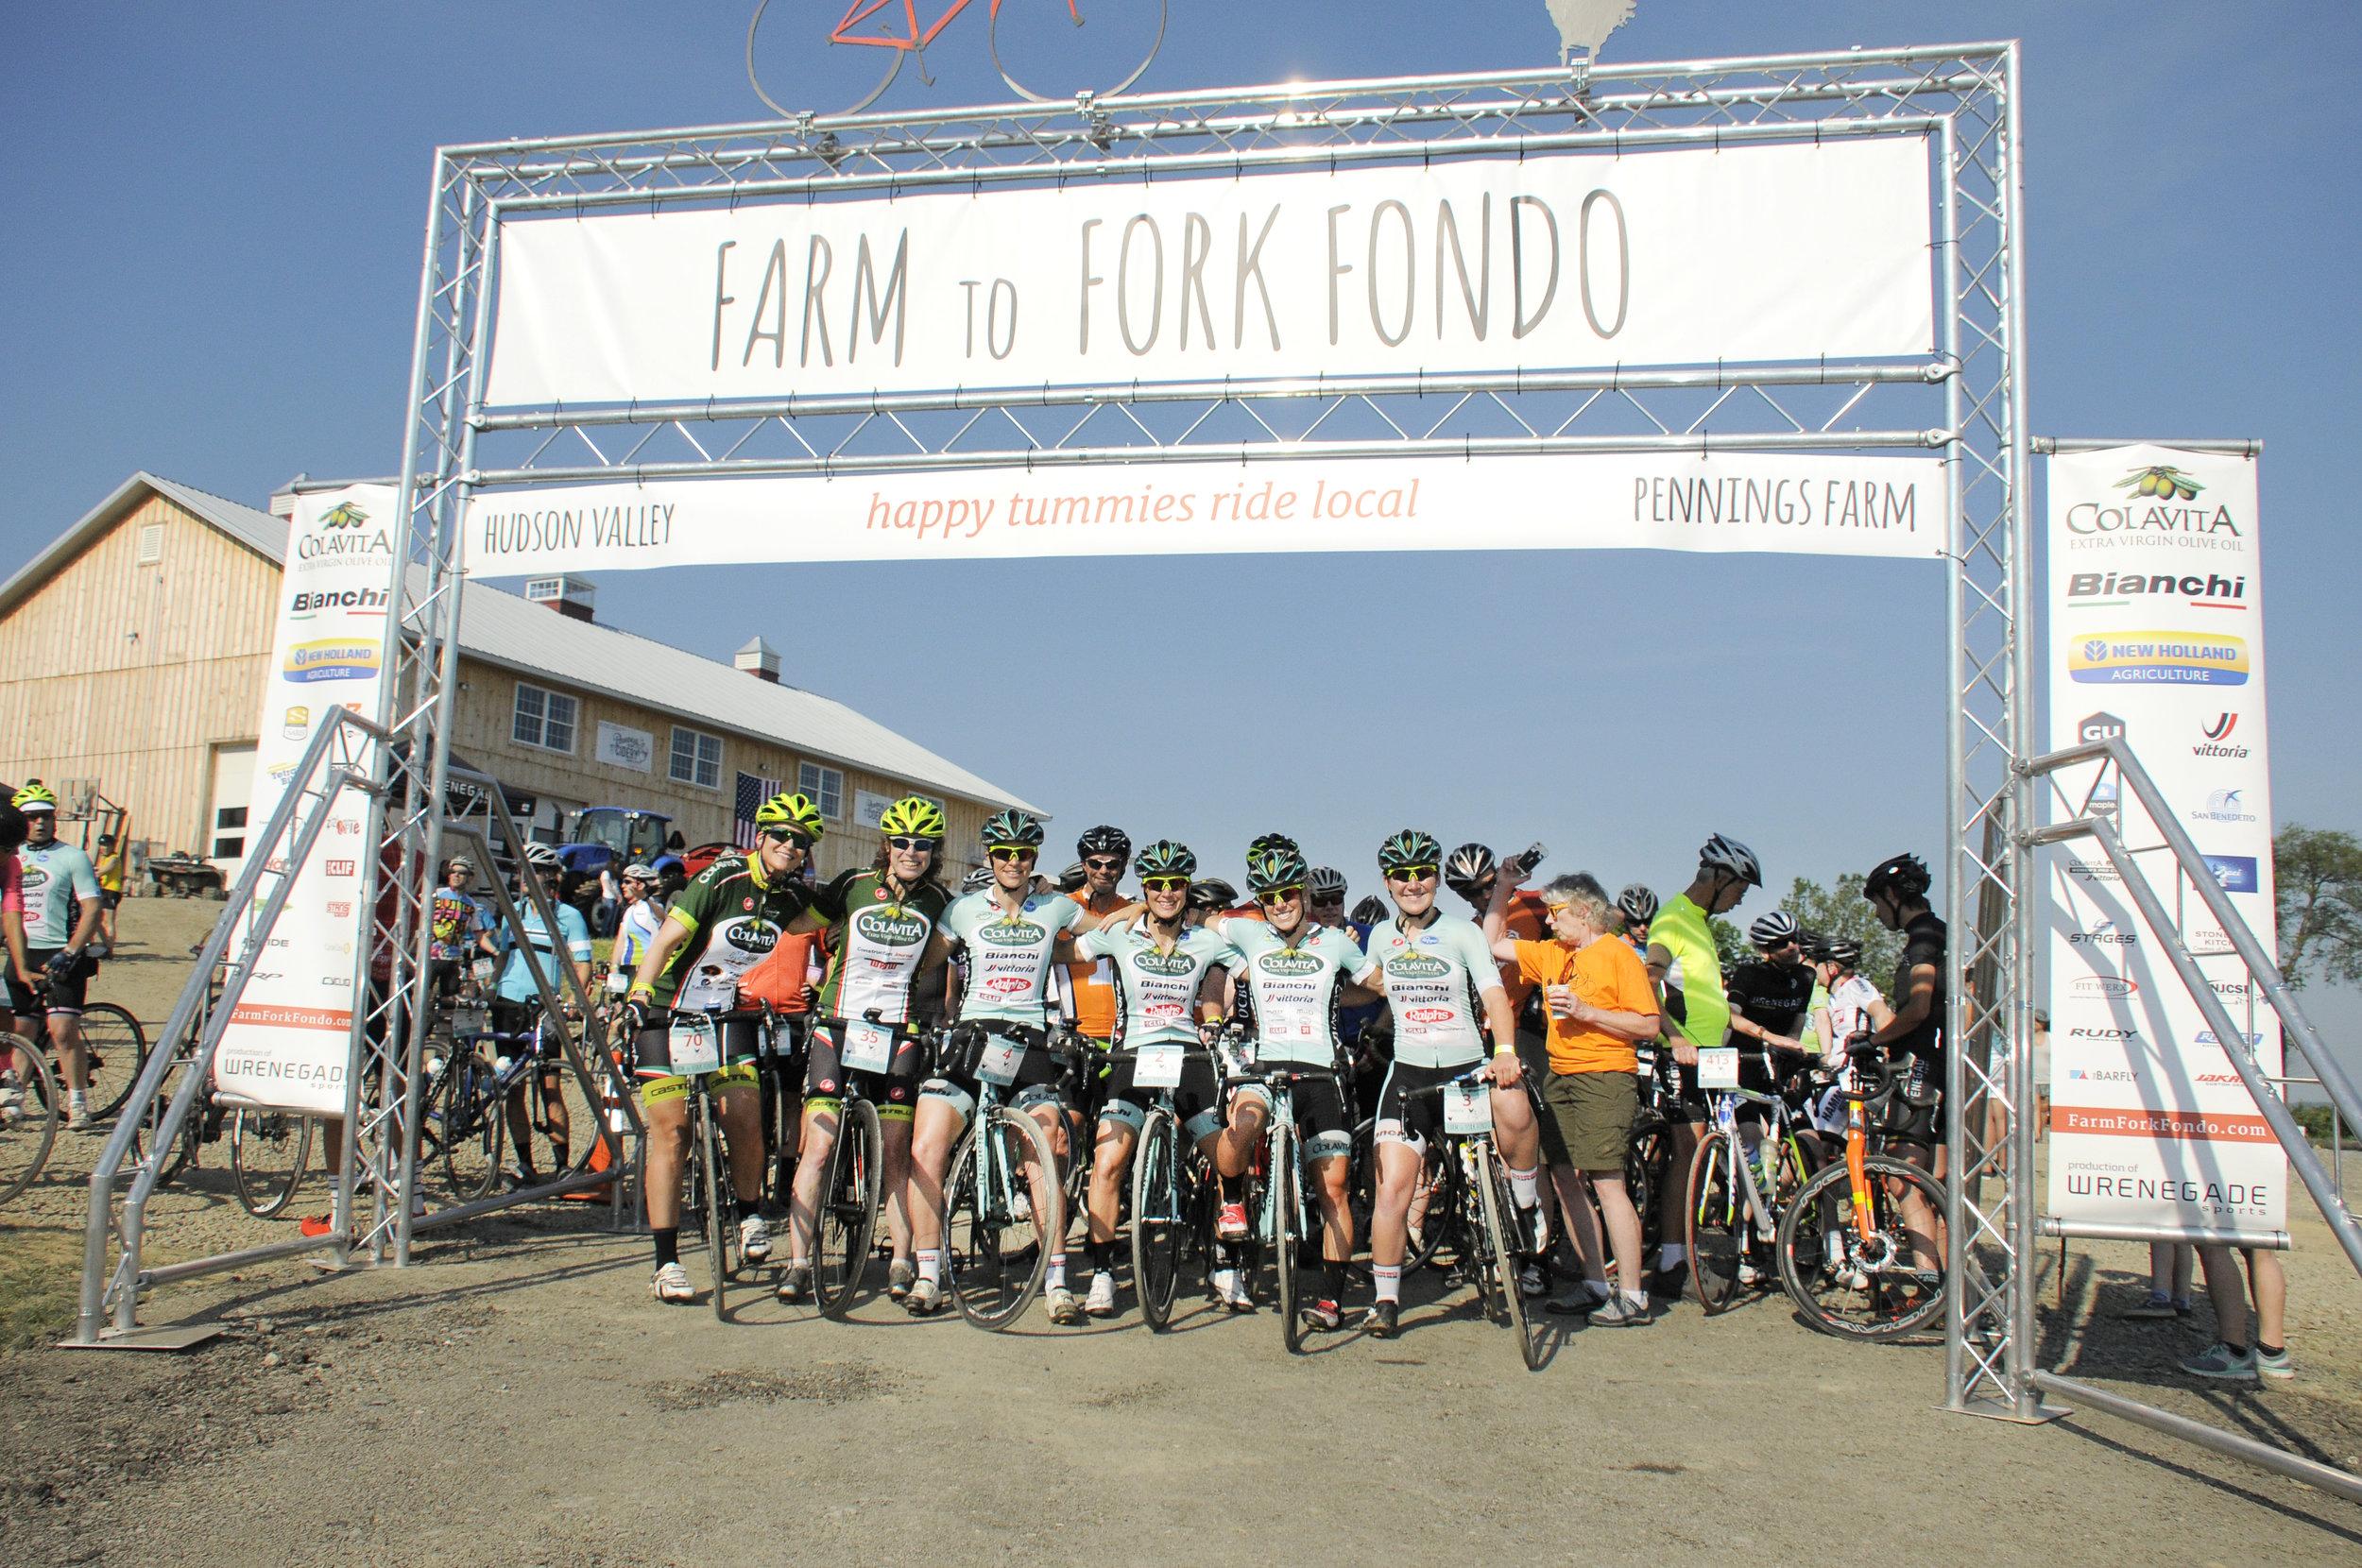 Team Colavita | BIanchi at Farm to Fork Fondo - Hudson Valley